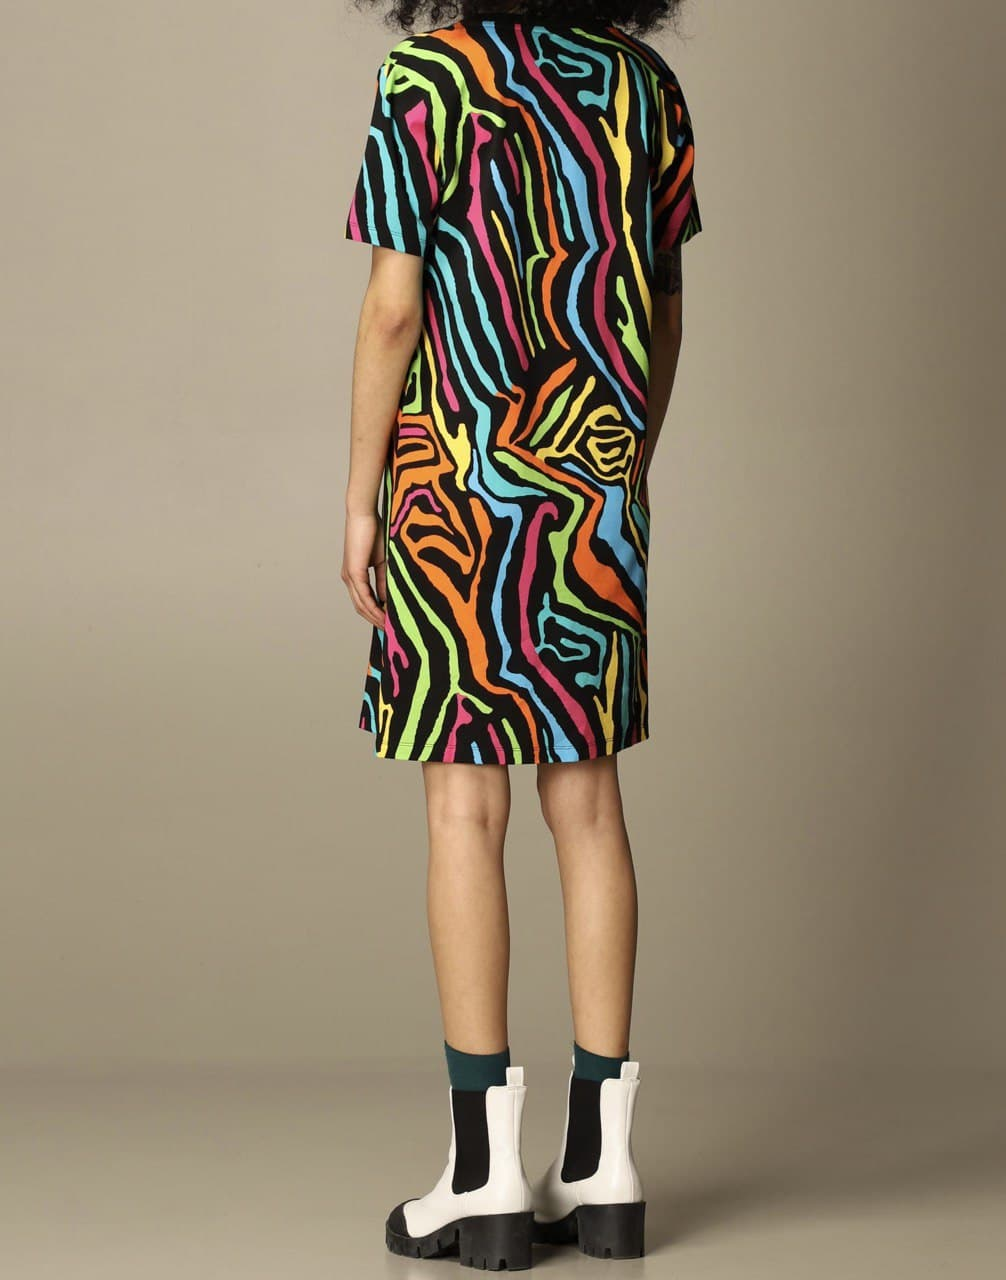 MOSCHINO SWIM   Dress   A191421191555